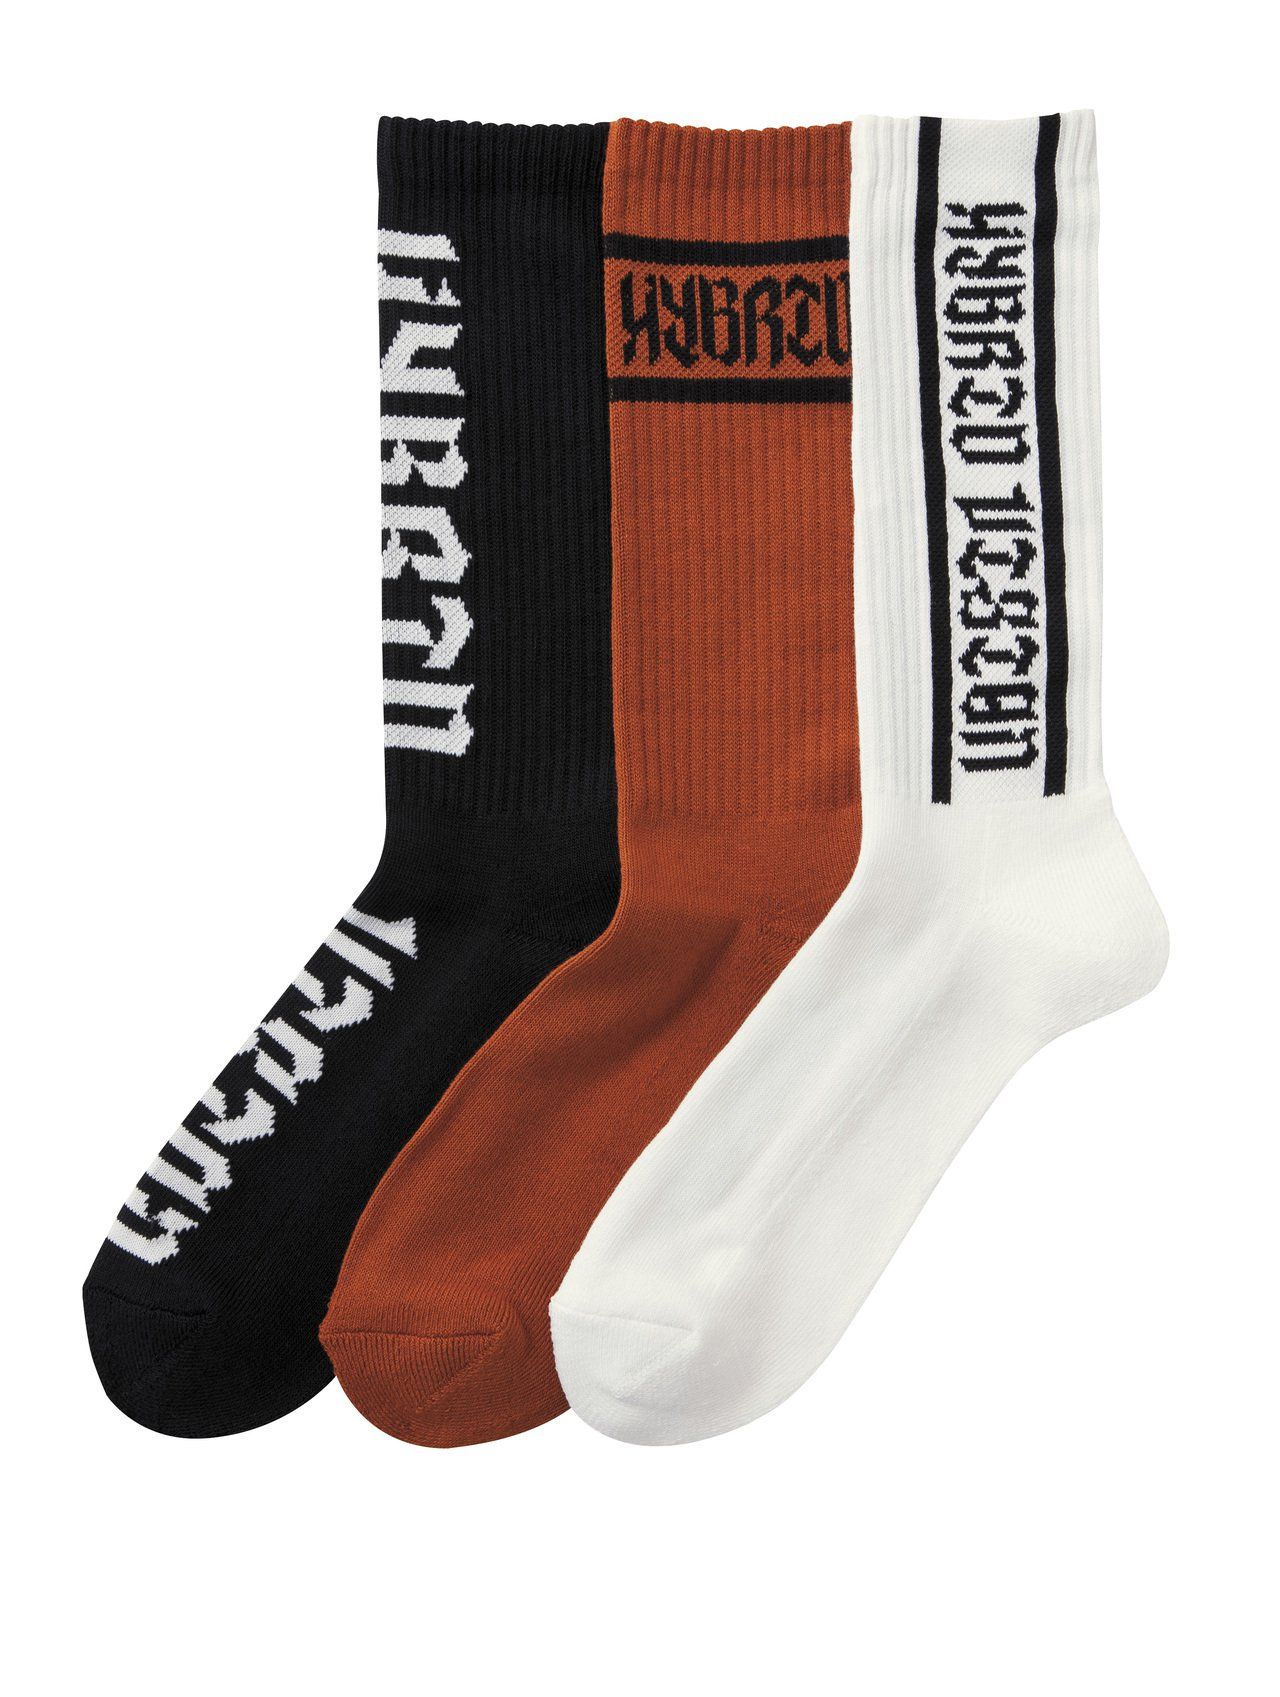 GU「HYBRID TOKYO」系列襪子3雙裝190元。圖/GU提供